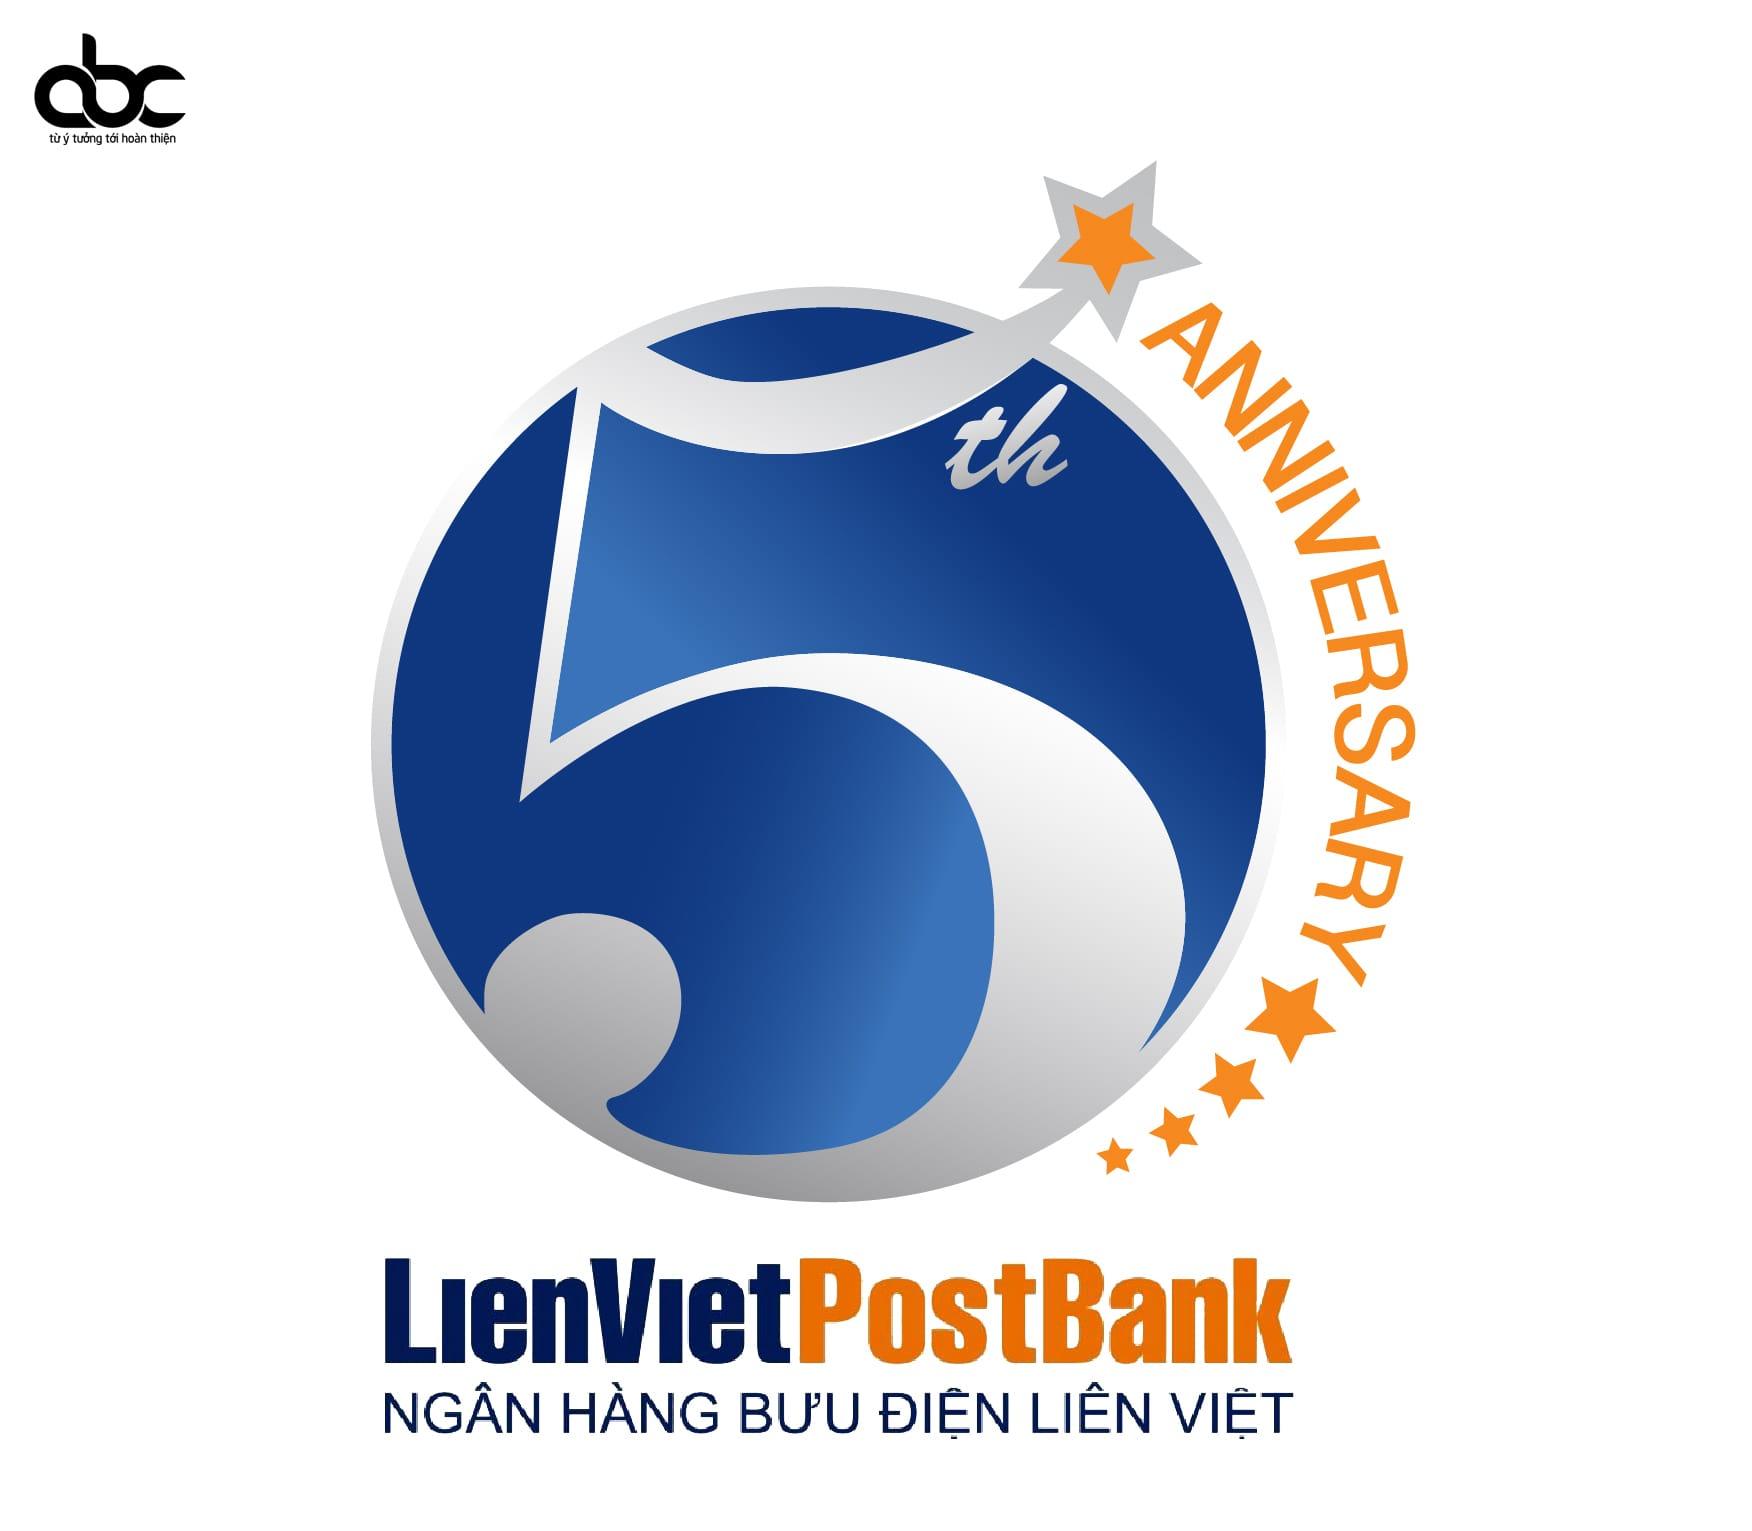 thiet-ke-logo-su-kien-sinh-nhat-5-nam-lien-viet-post-bank